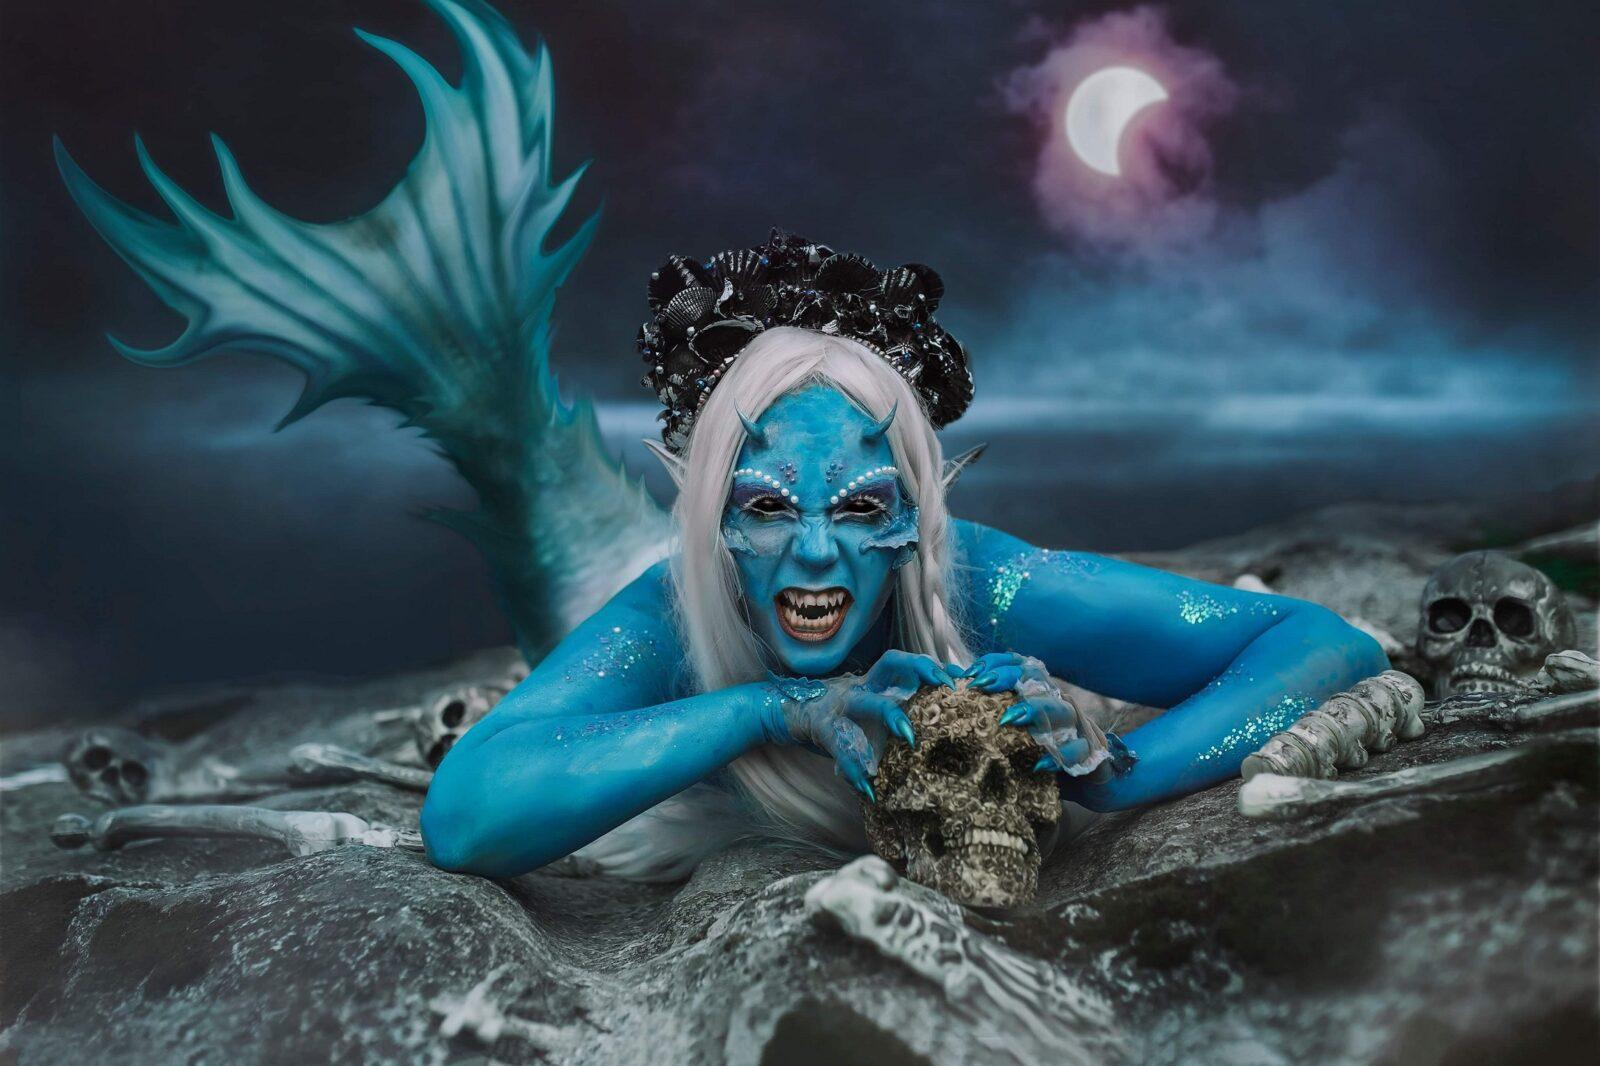 JenniferHarlow-2020-Halloween-Contest